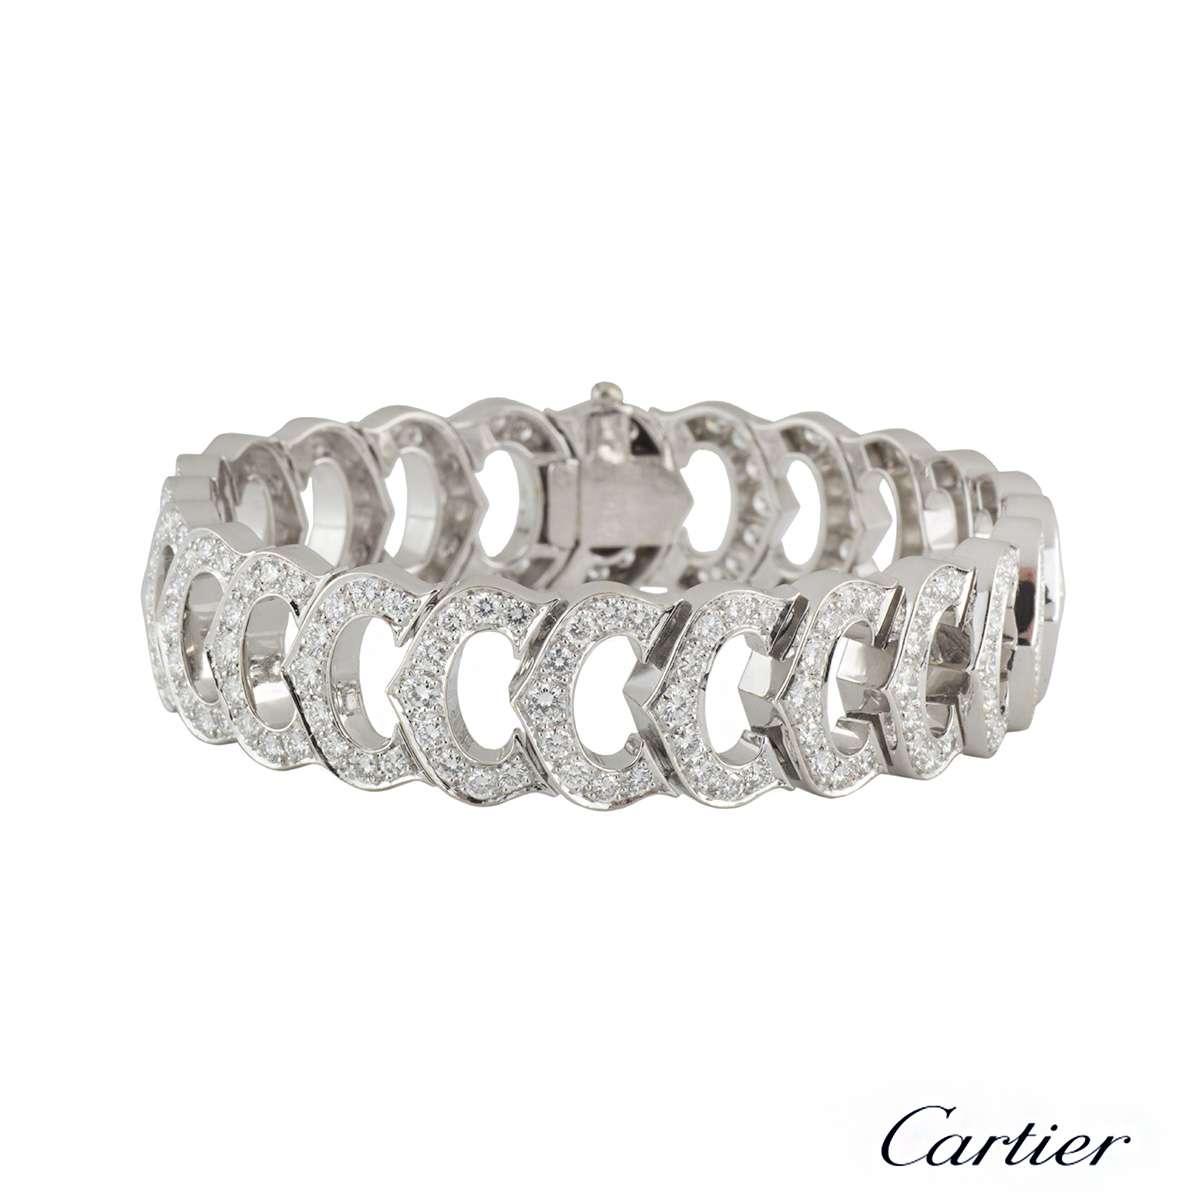 cartier c de cartier diamond bracelet and hoop earrings